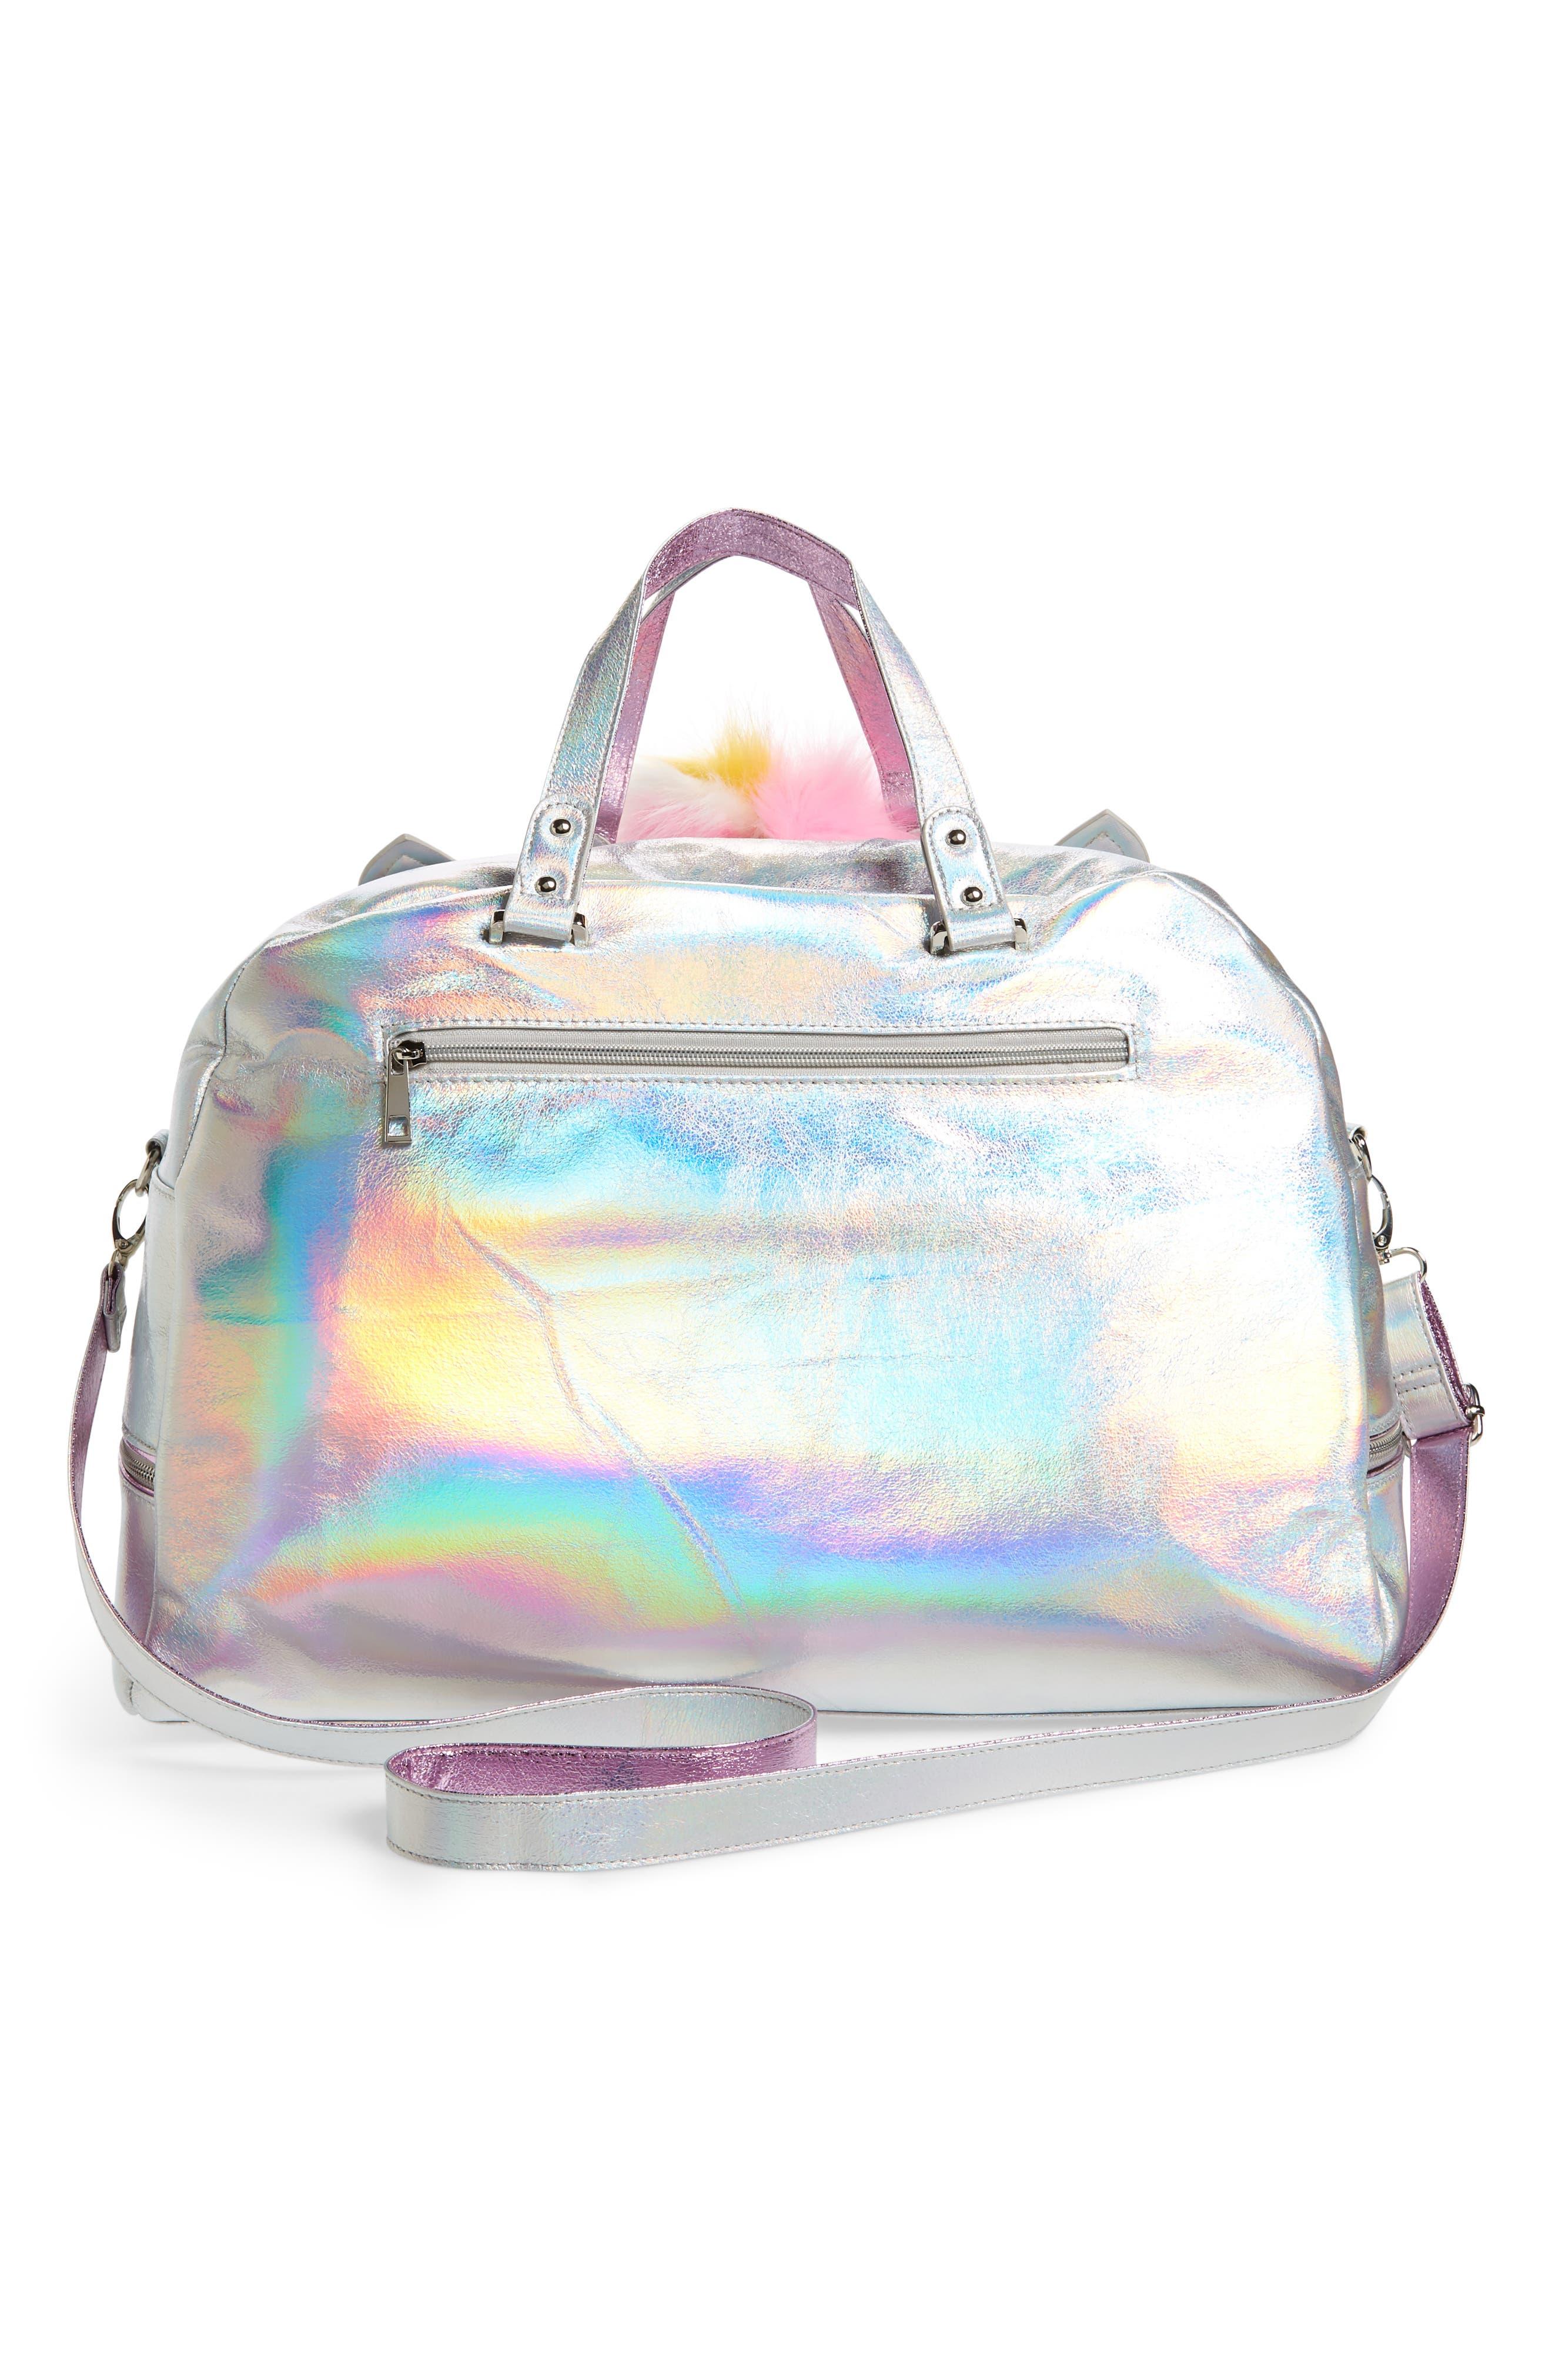 Duffel Bag,                             Alternate thumbnail 2, color,                             Silver Iridescent Unicorn